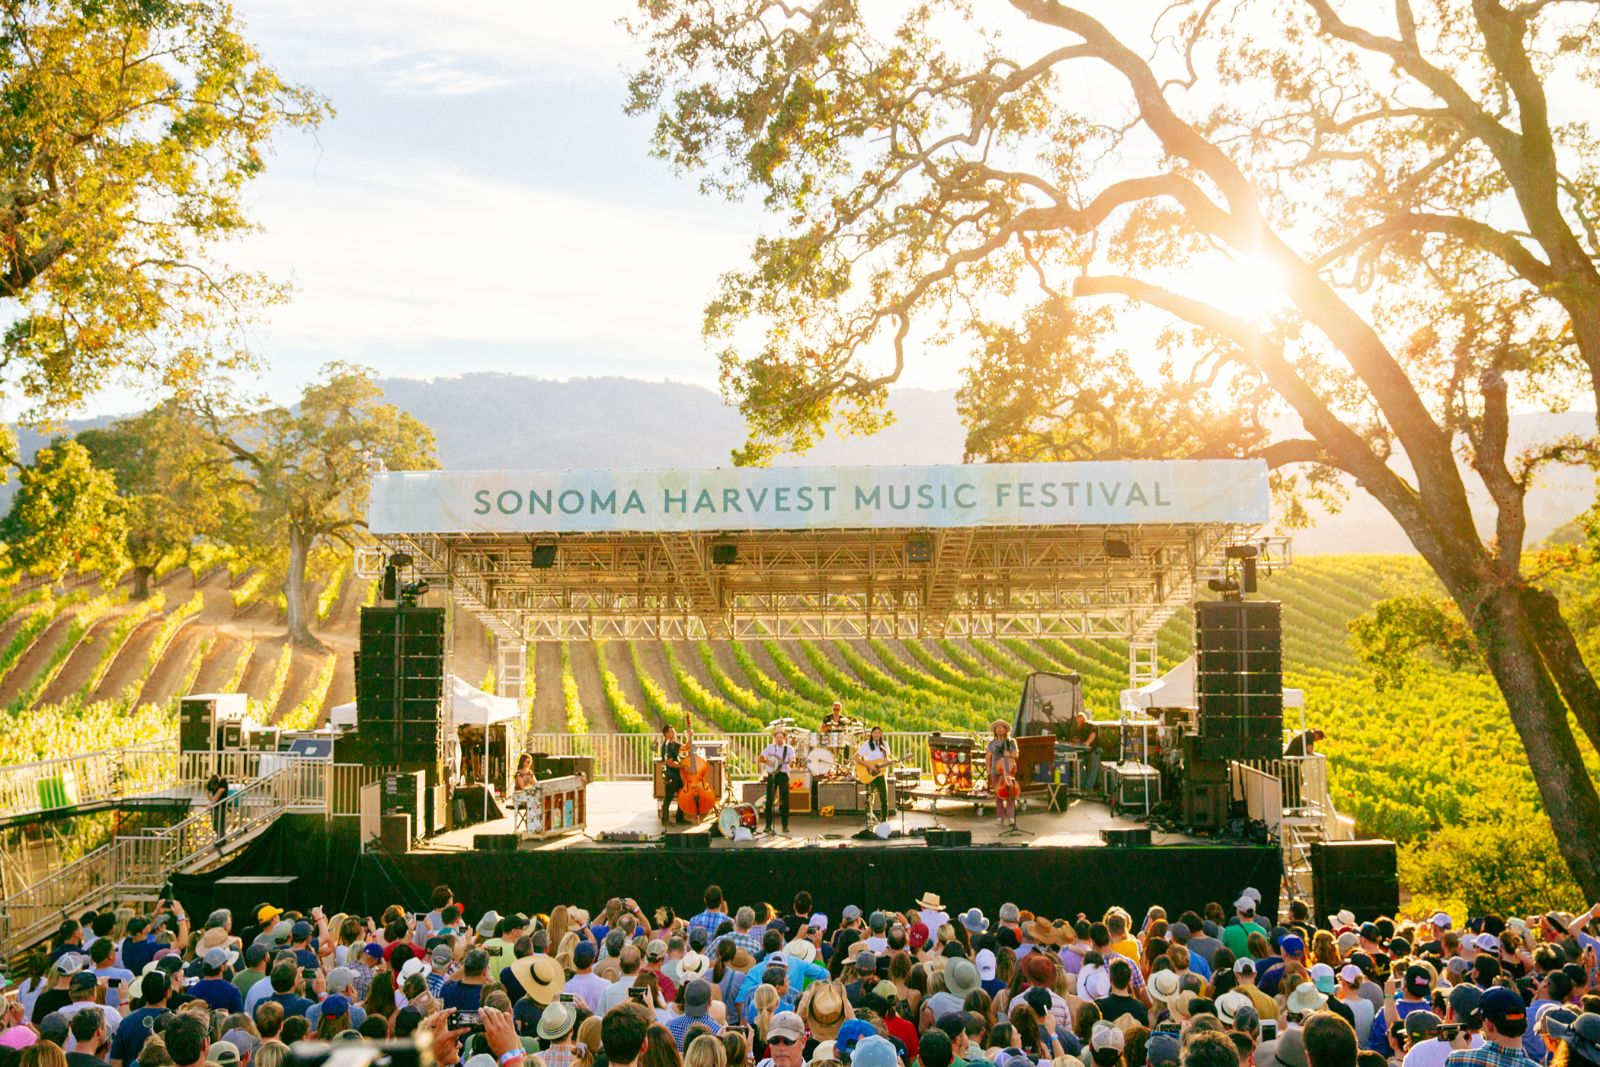 Sonoma Harvest Music Festiva